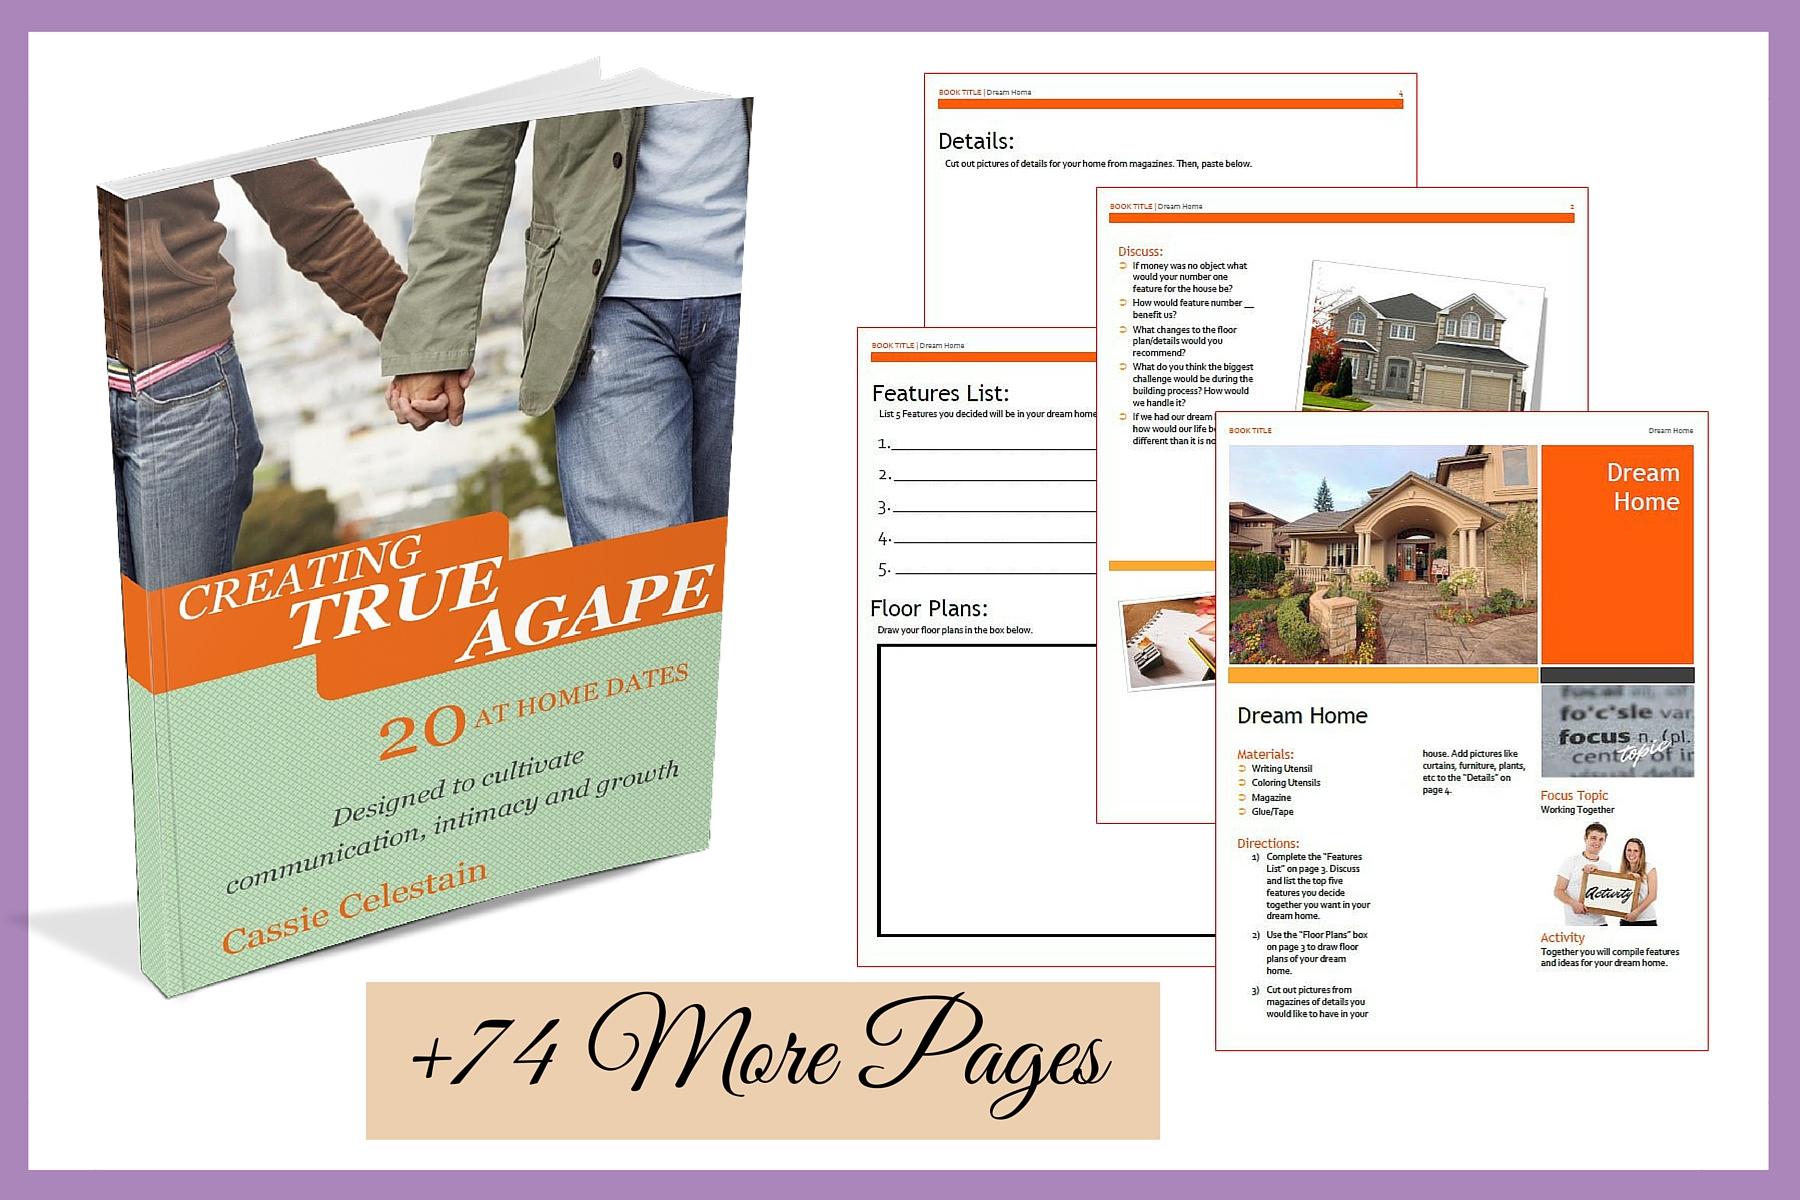 Creating True Agape- 20 at home dates